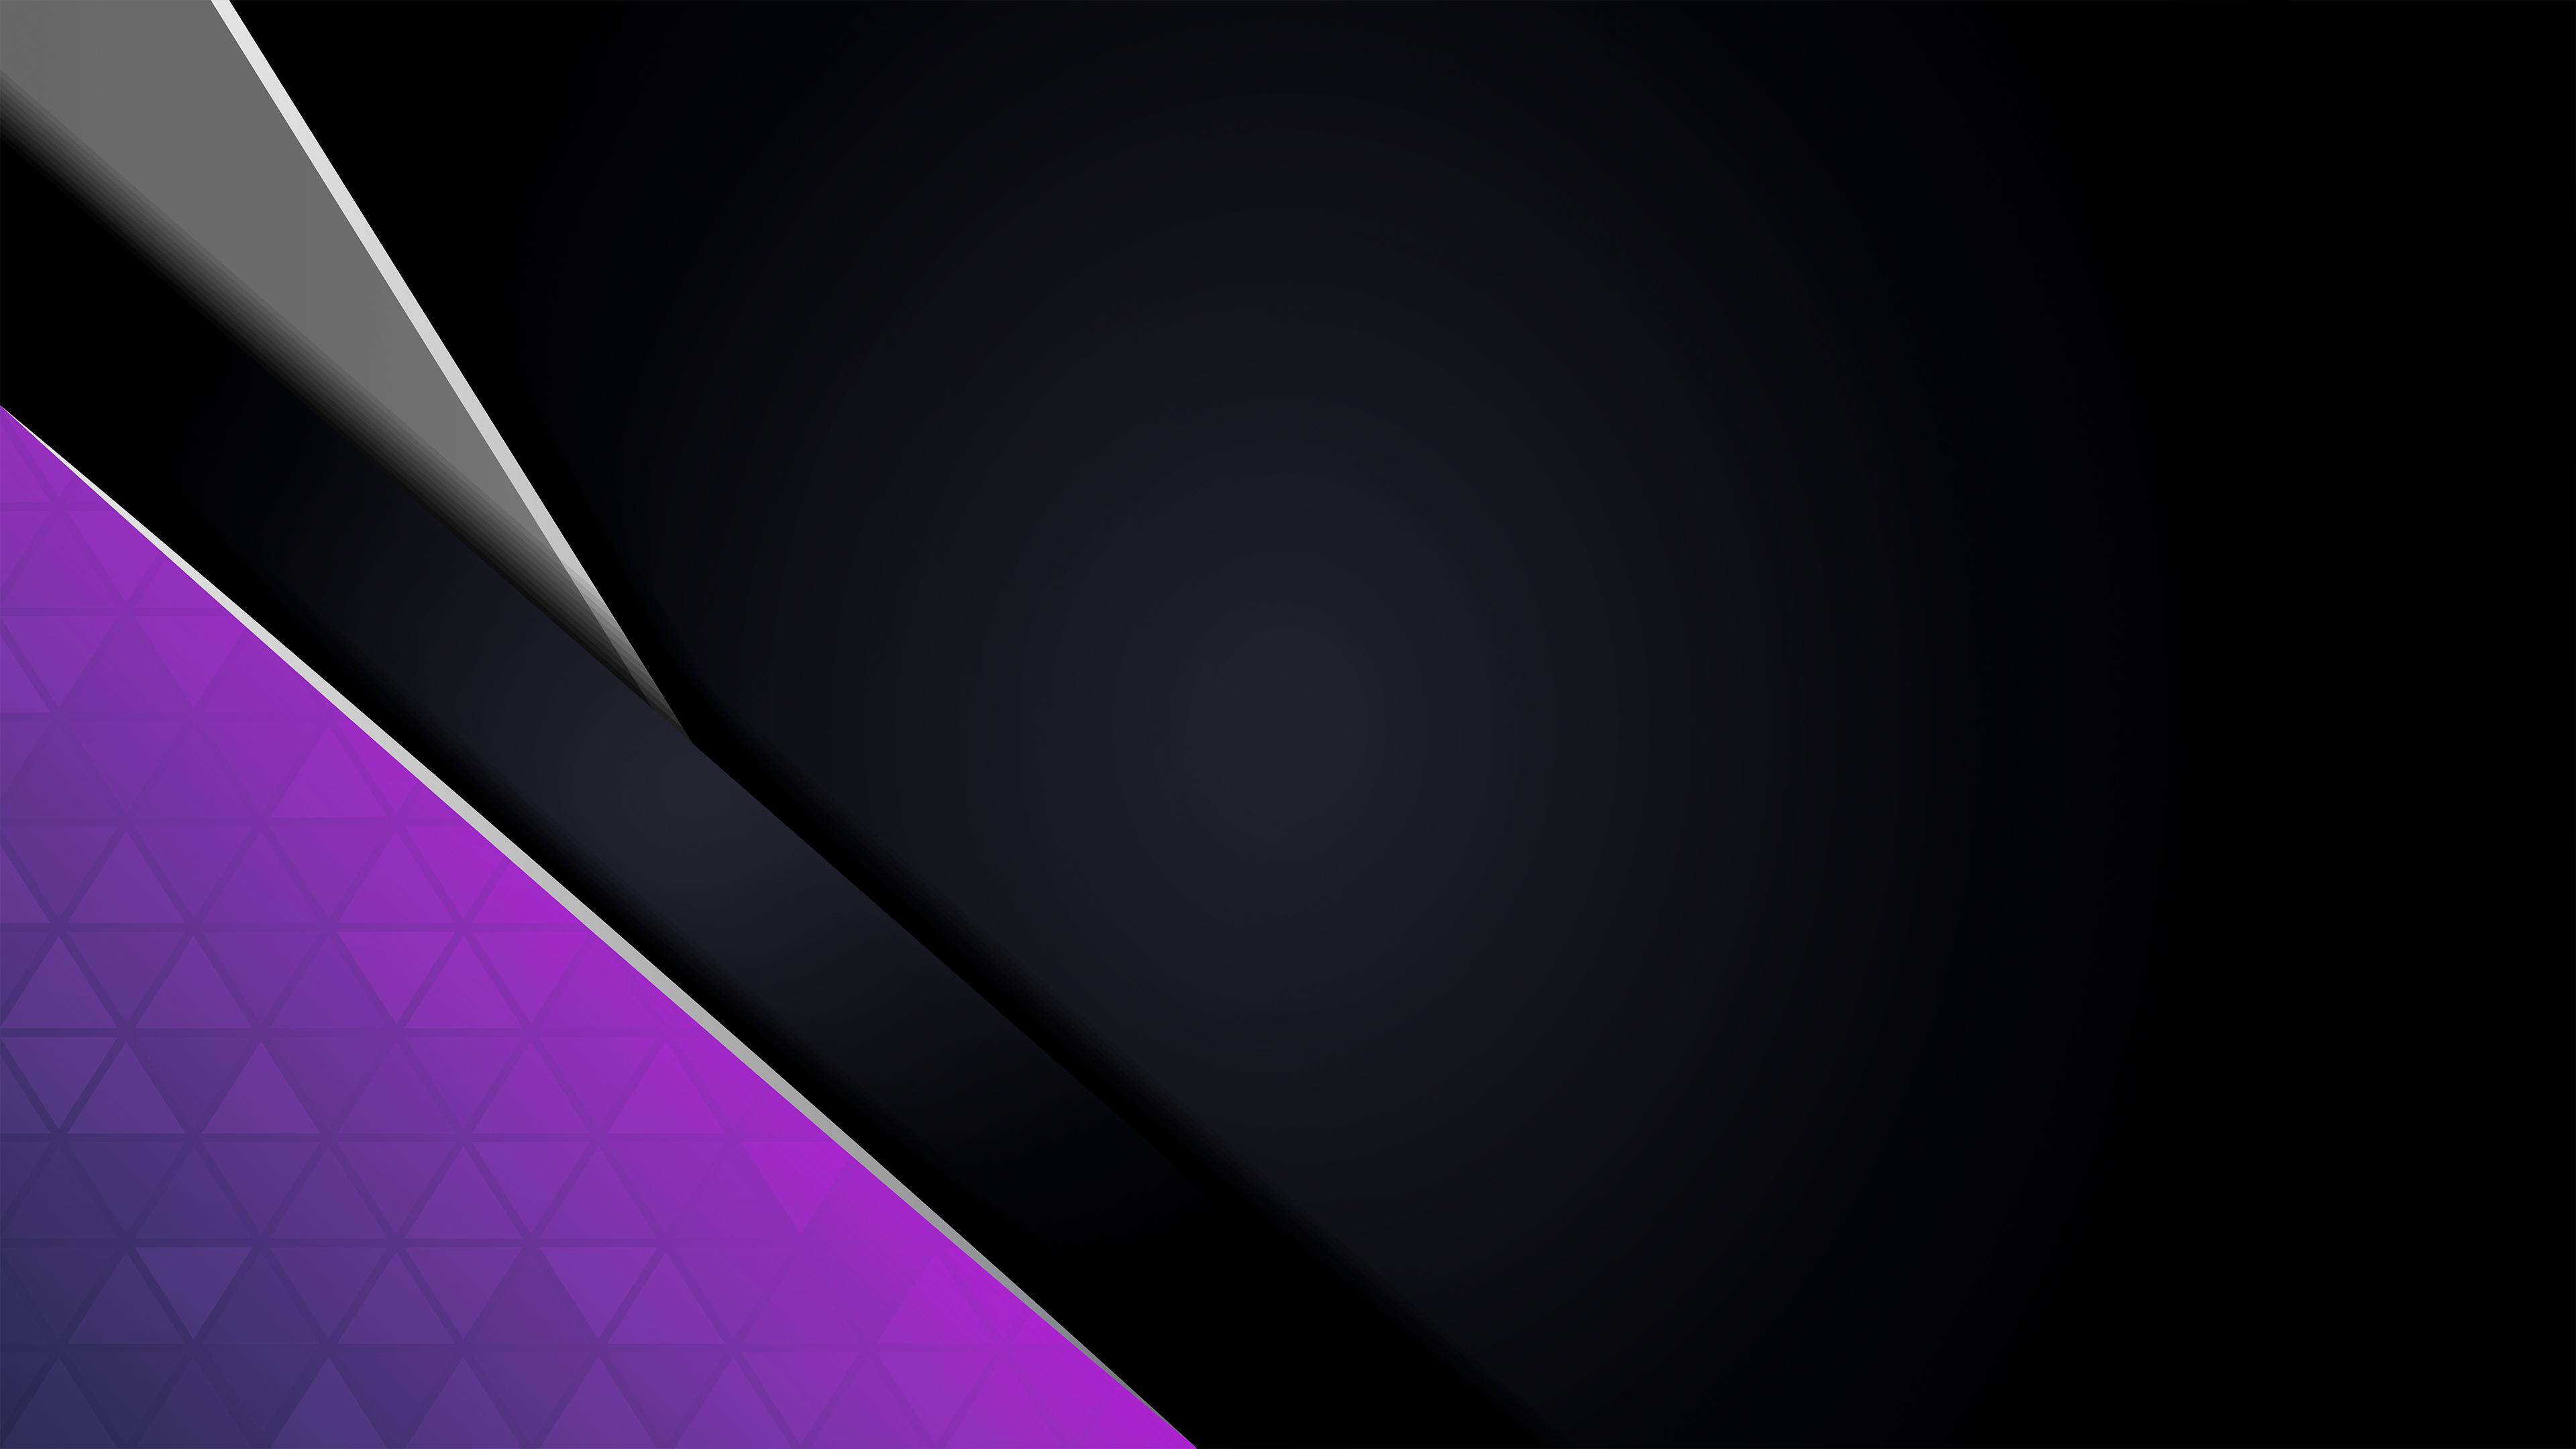 purple grey minimal abstract 1602345560 - Purple Grey Minimal Abstract - Purple Grey Minimal Abstract